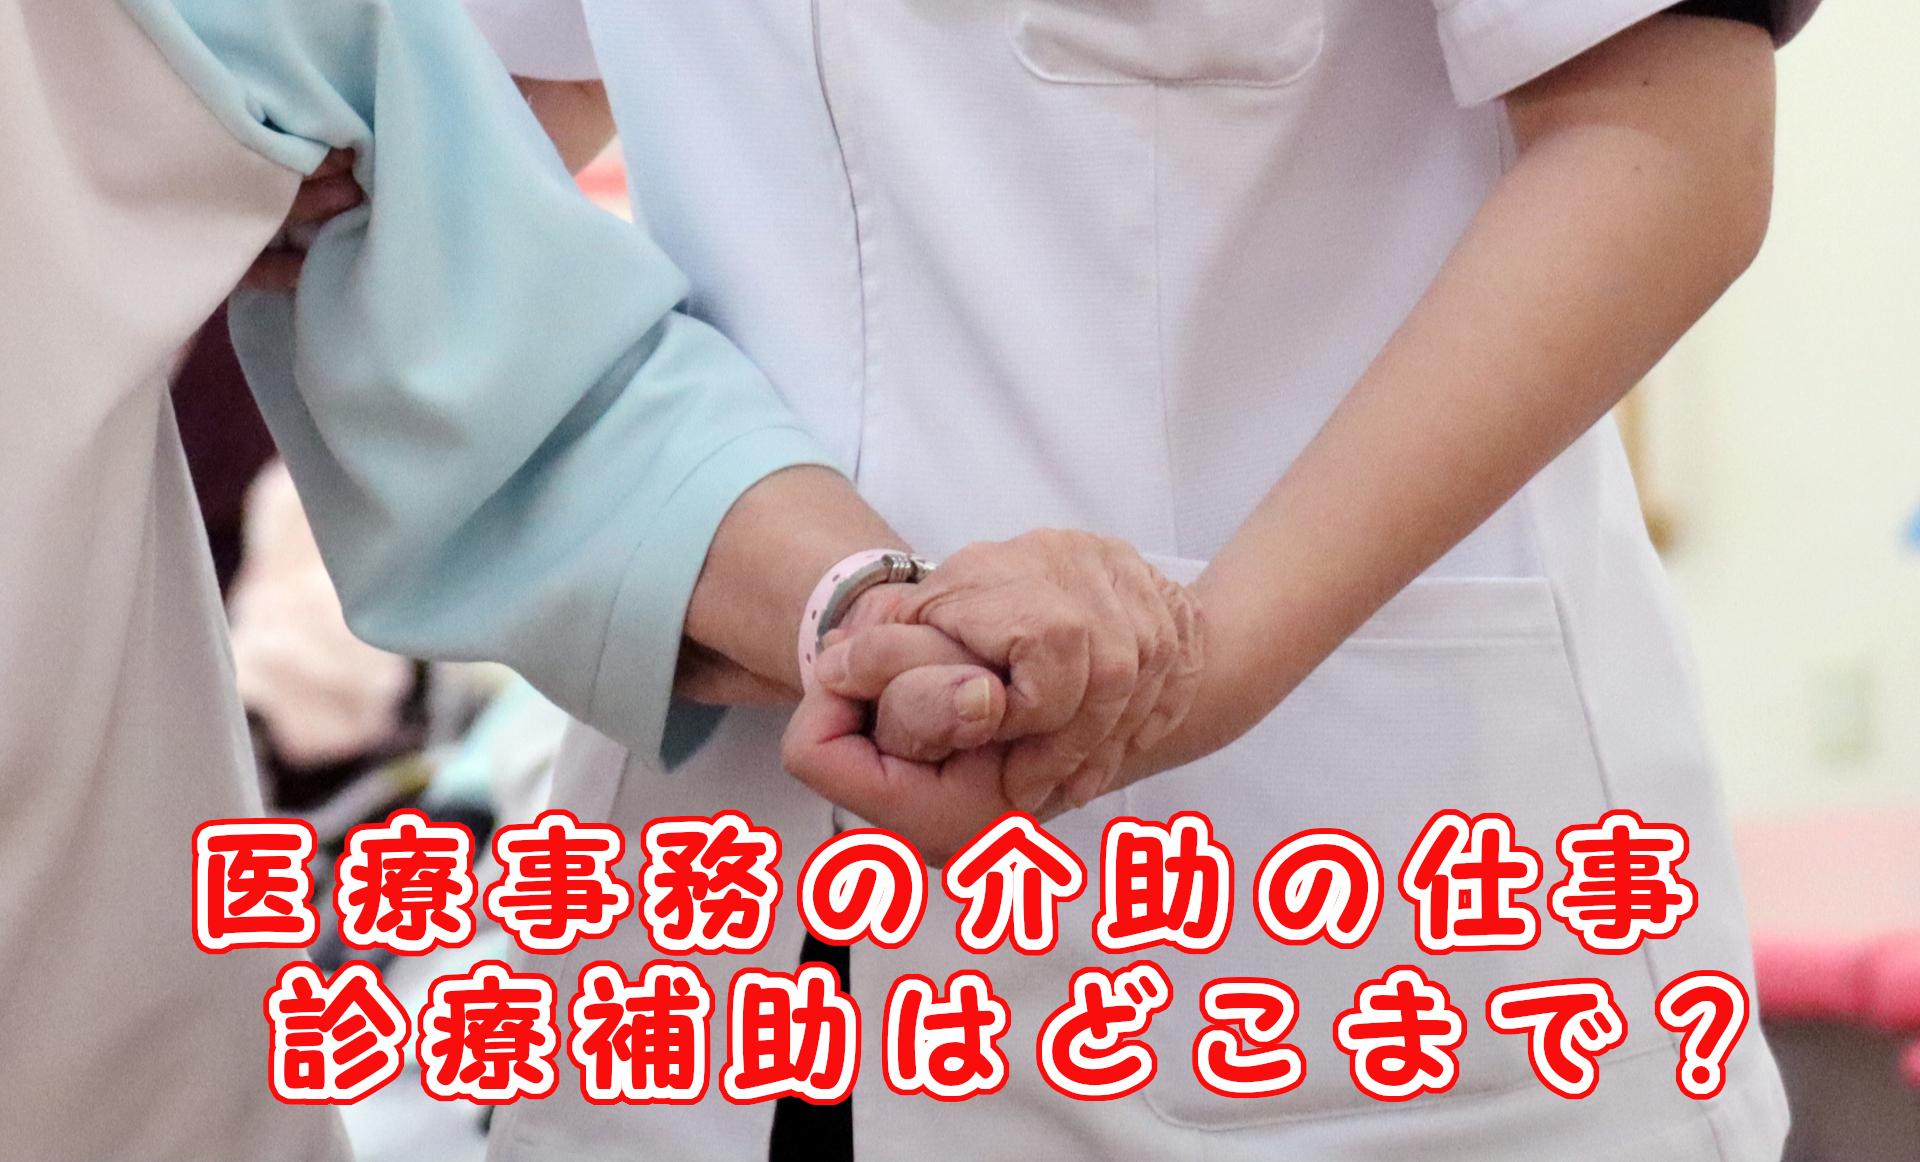 医療事務の介助・診療補助